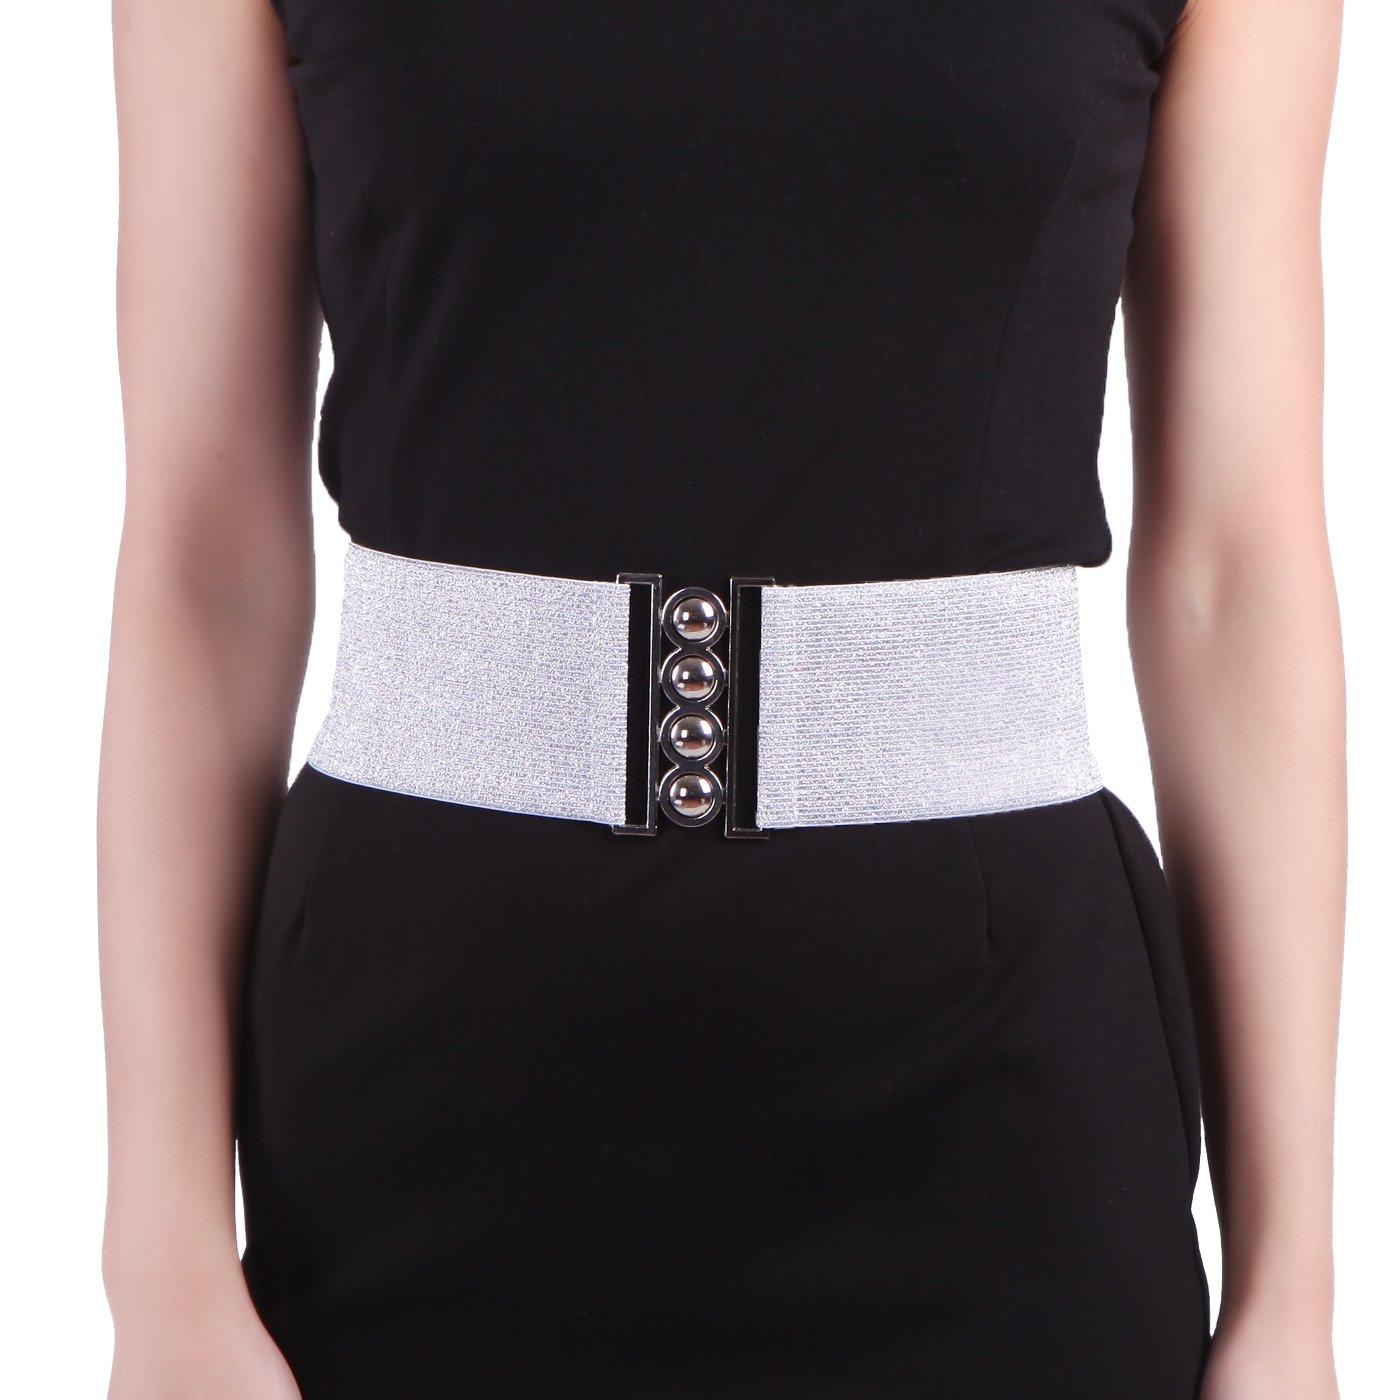 HDE Women's Cinch Belt Elastic Stretch Fashion Waist Band W/Clasp Buckle XS-5X HDE-50031